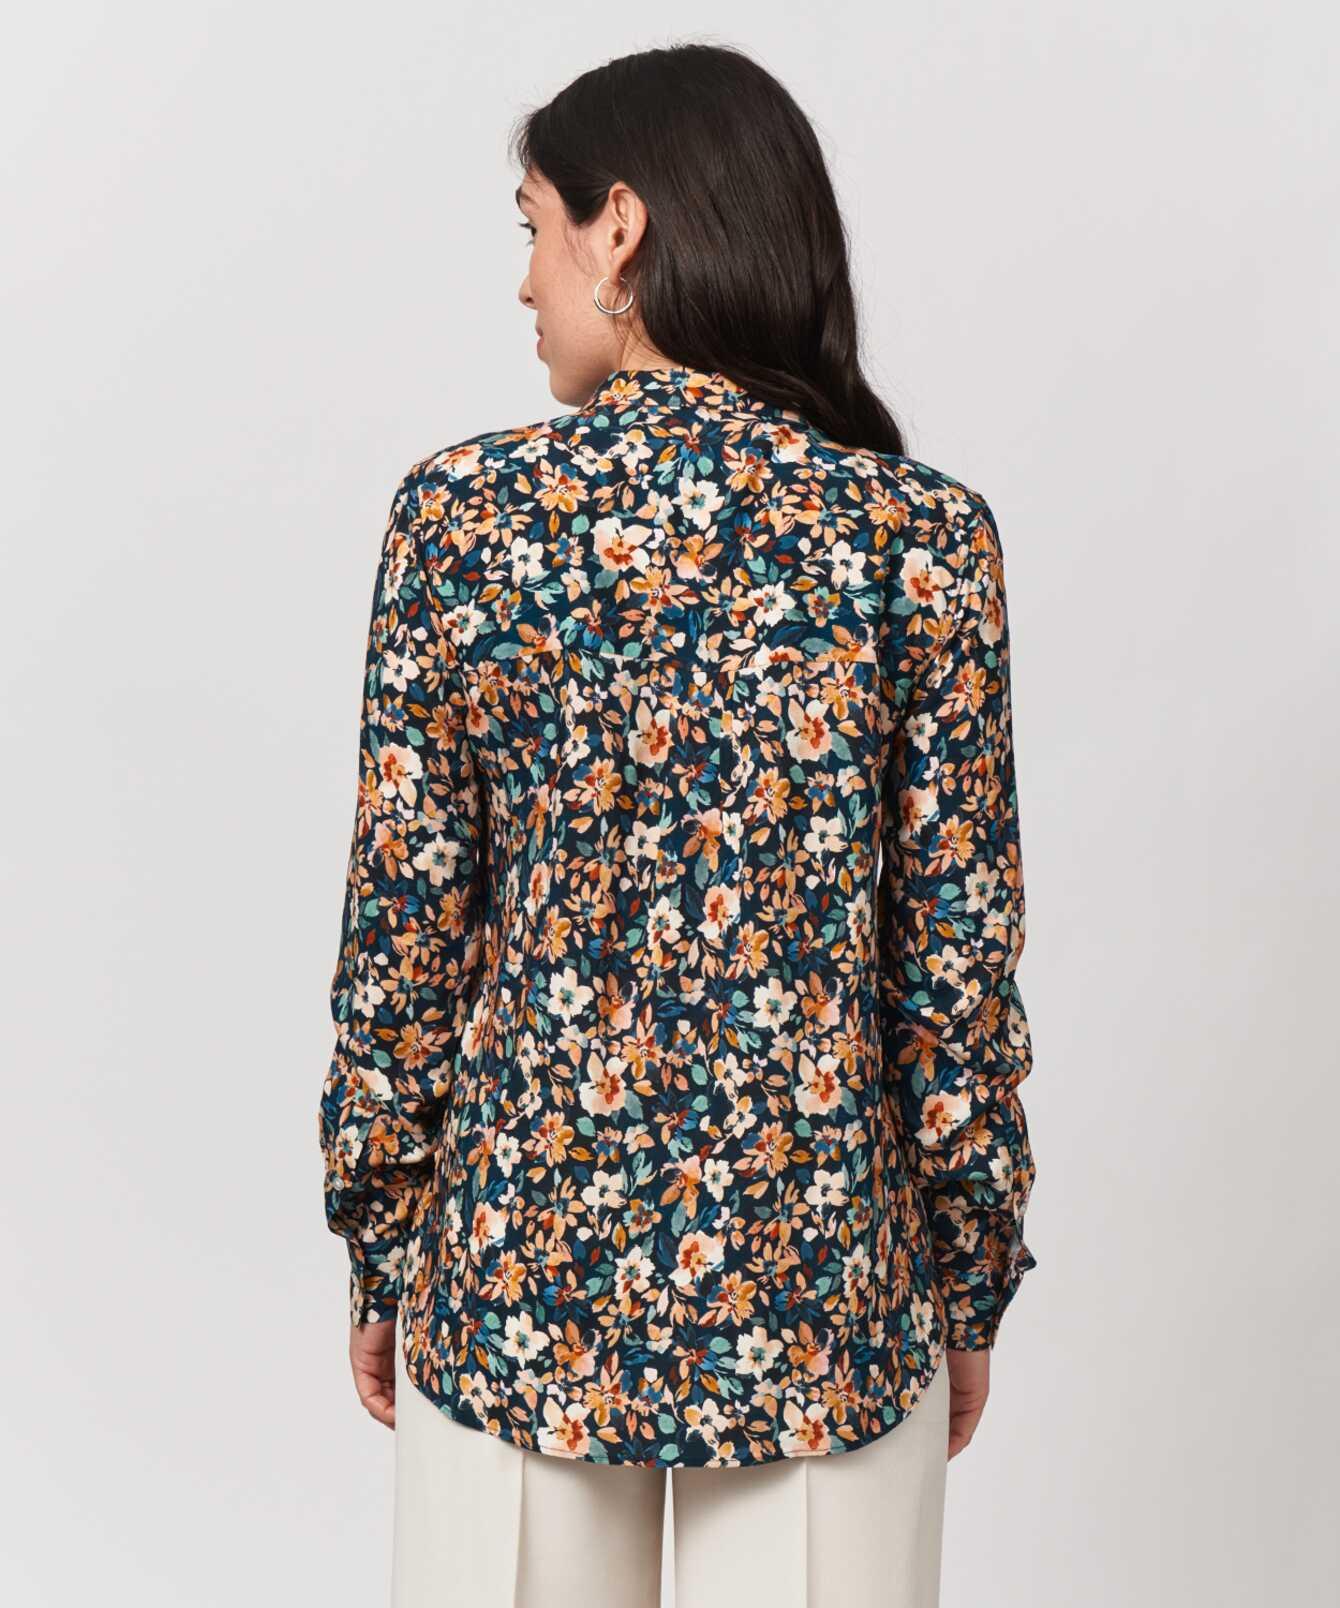 Skjorta Lauren Season The Shirt Factory